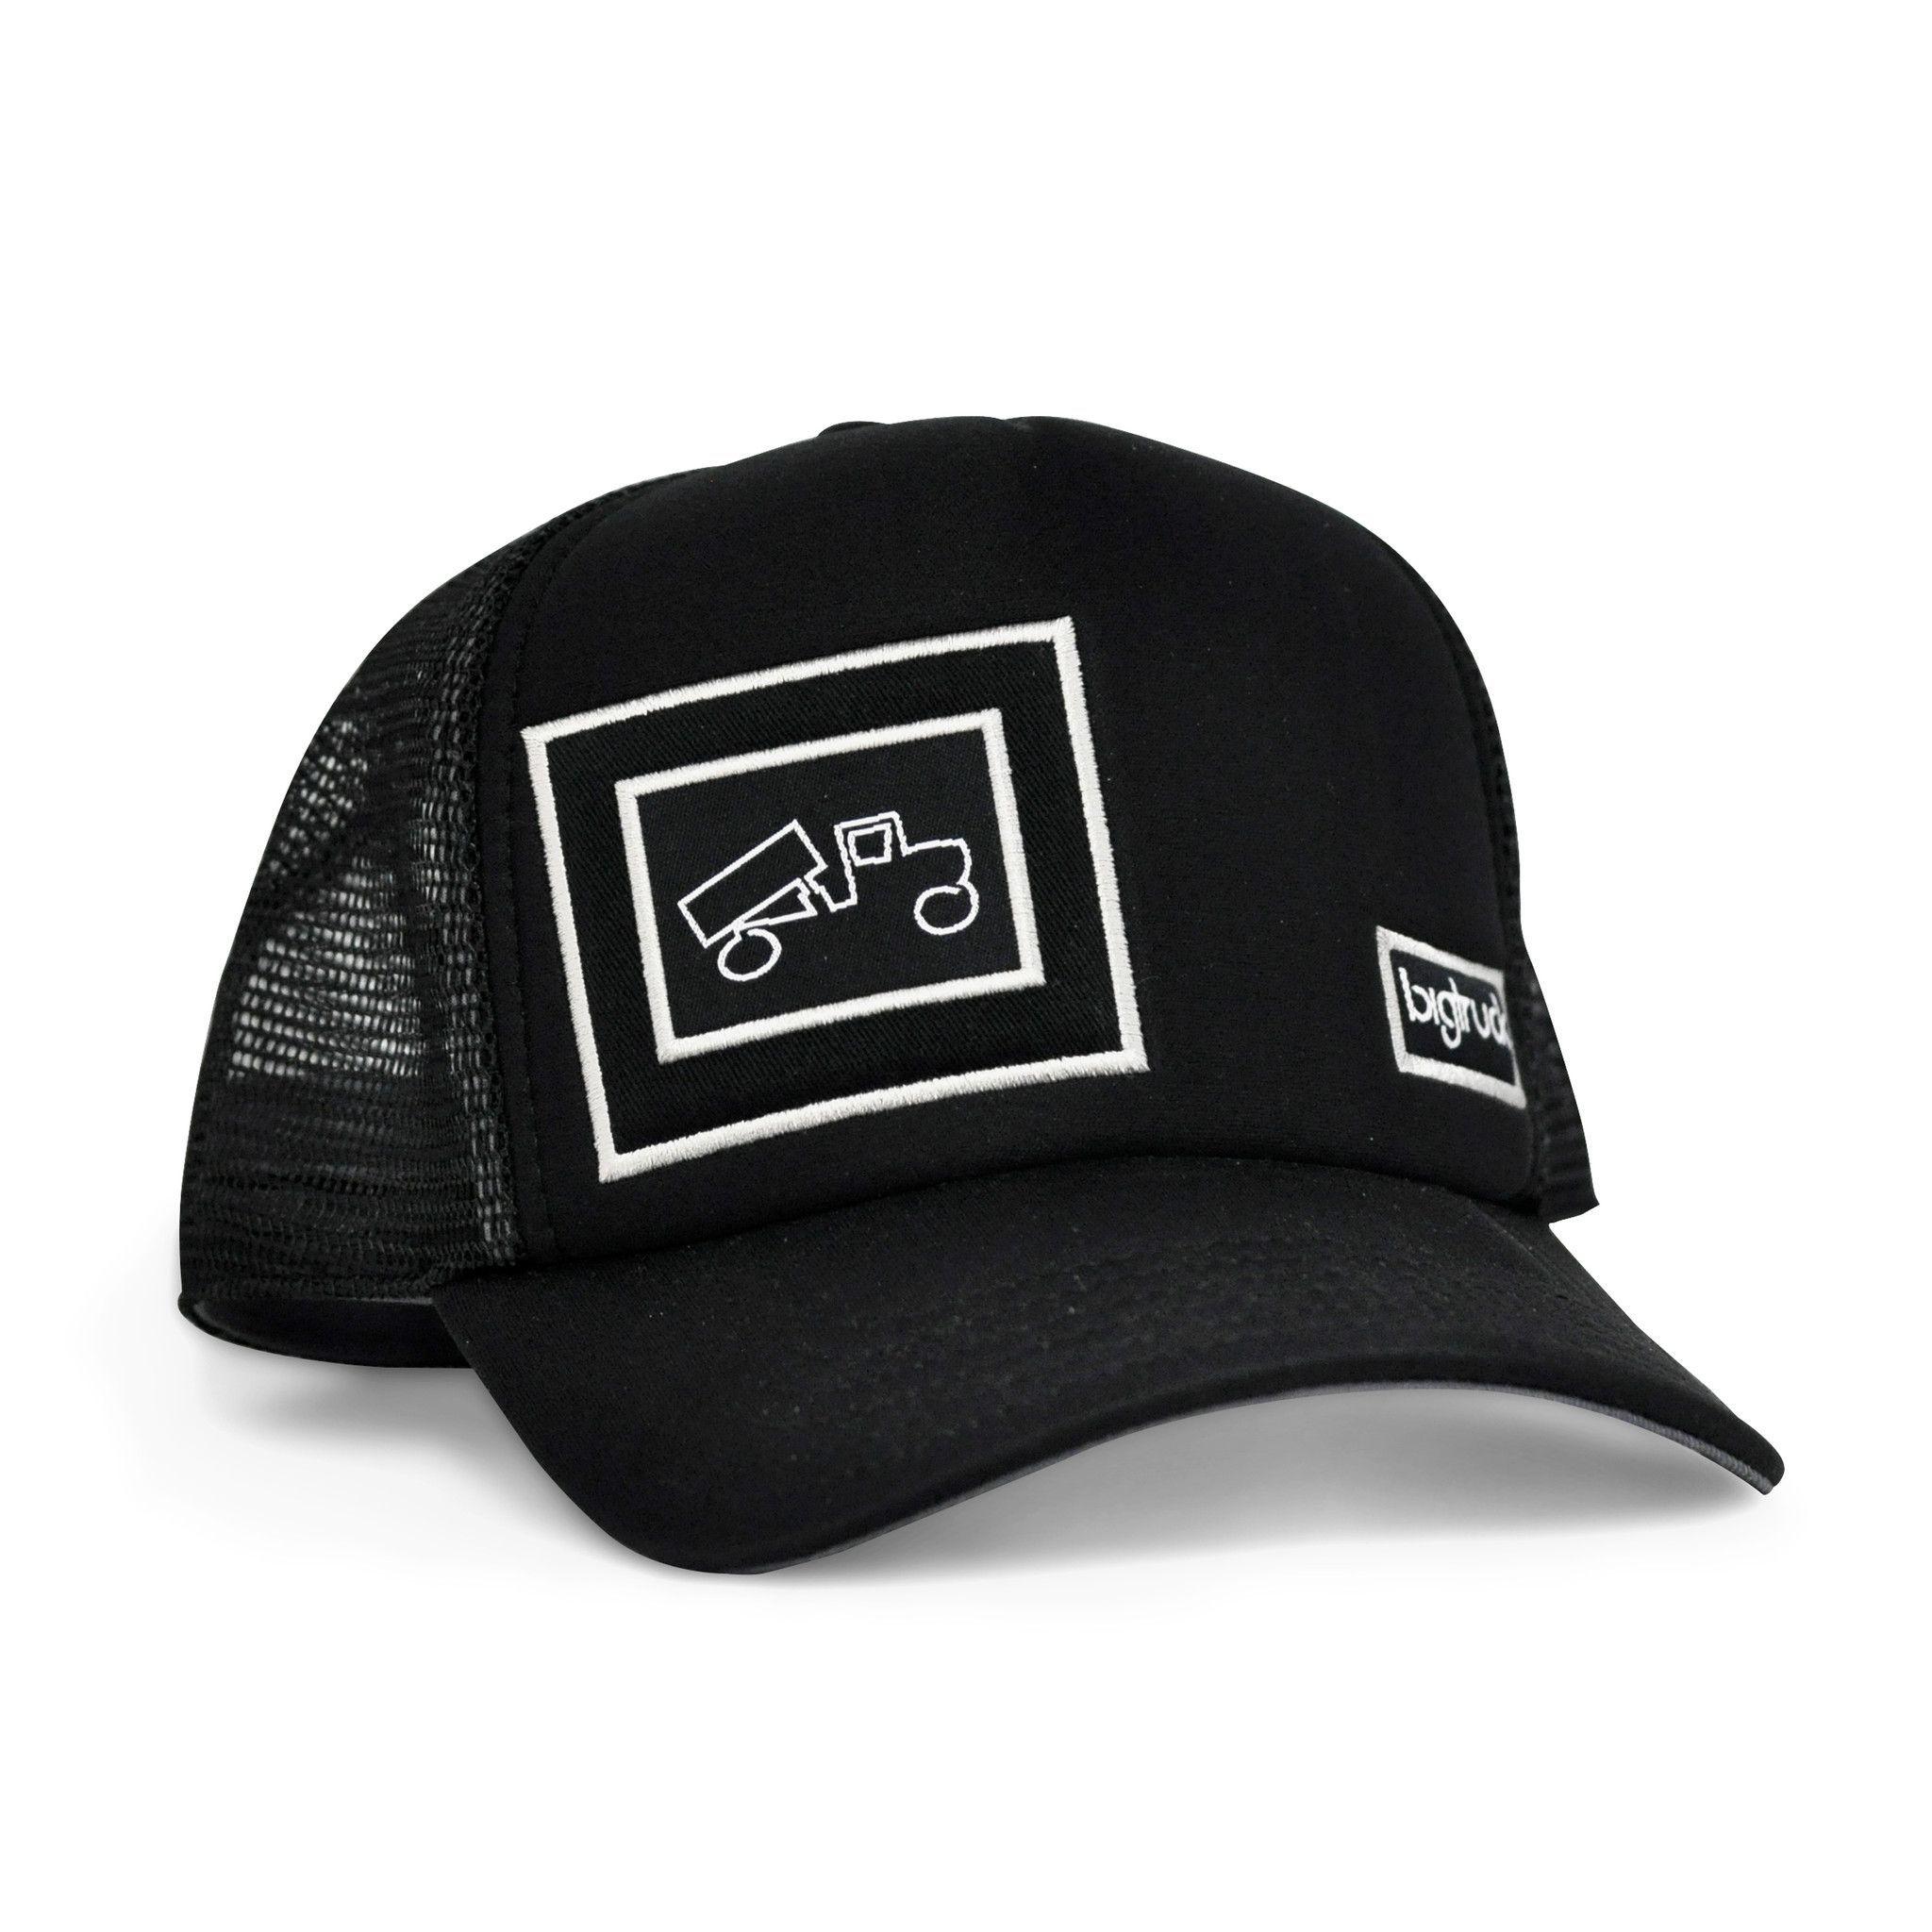 40f164bdf429b4 ORIGINAL OG BLACK Black Trucker Hat, Snapback Hats, Big Trucks, The  Originals,